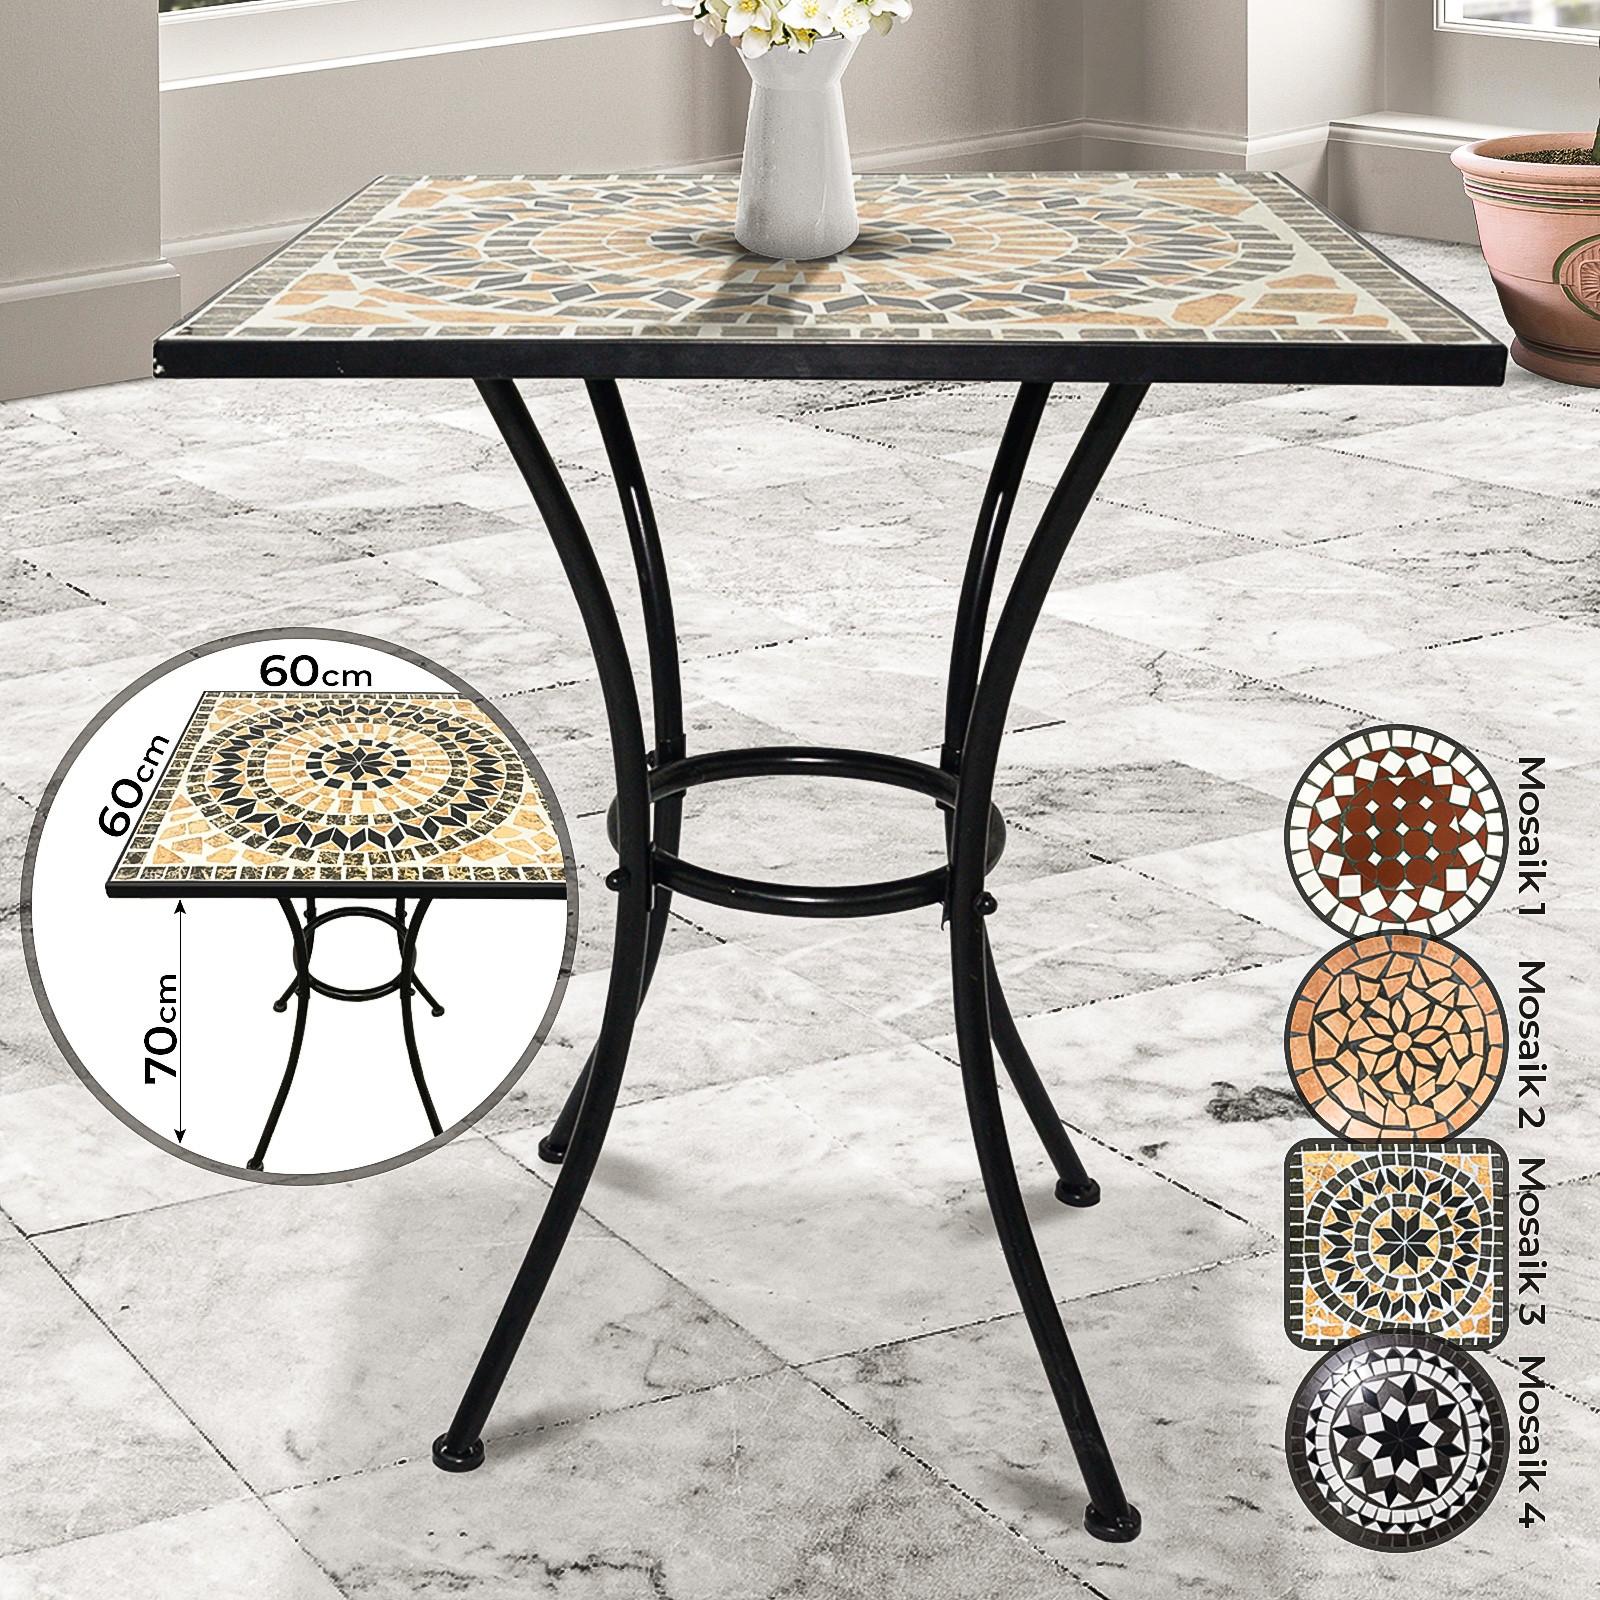 Arredamento da esterno Tavolo Mosaico da Giardino Tavolino ...